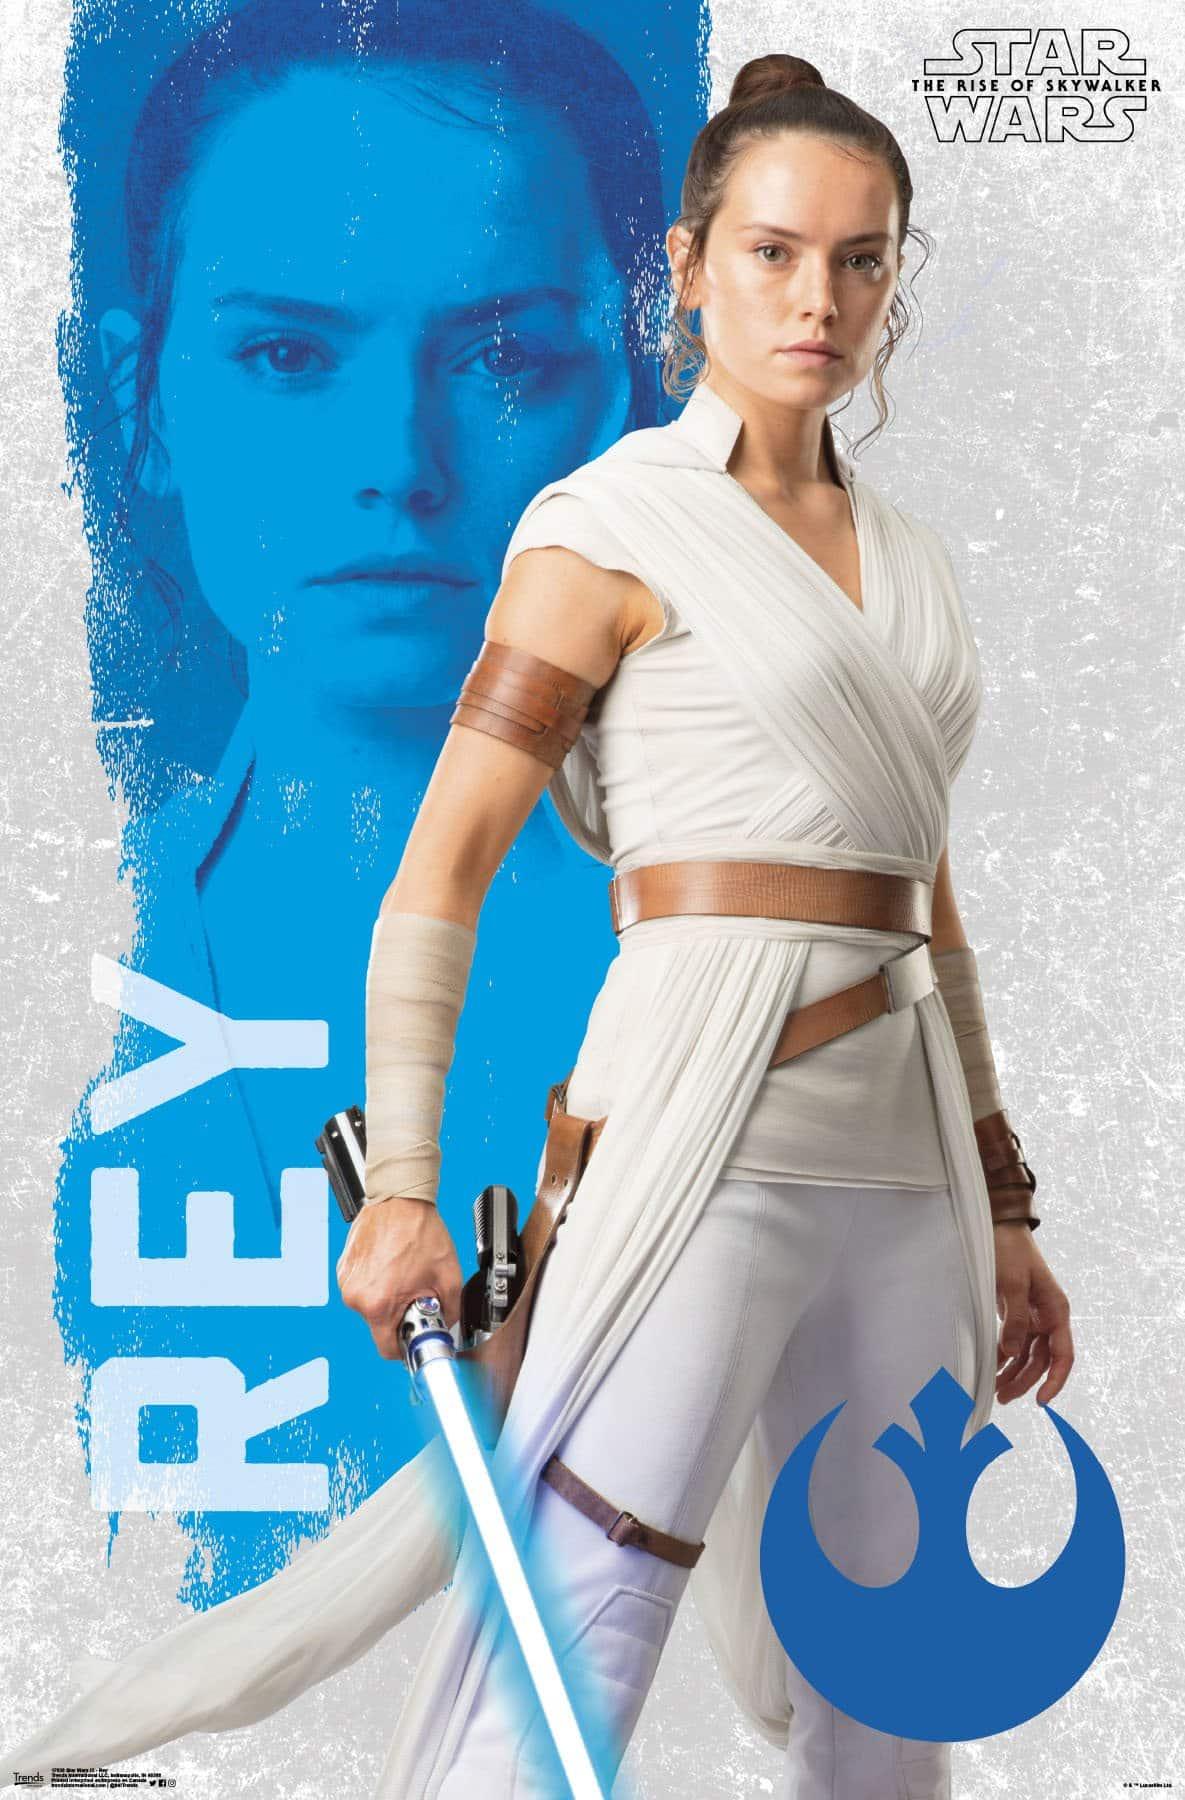 star wars 9 el ascenso de skywalker Rey